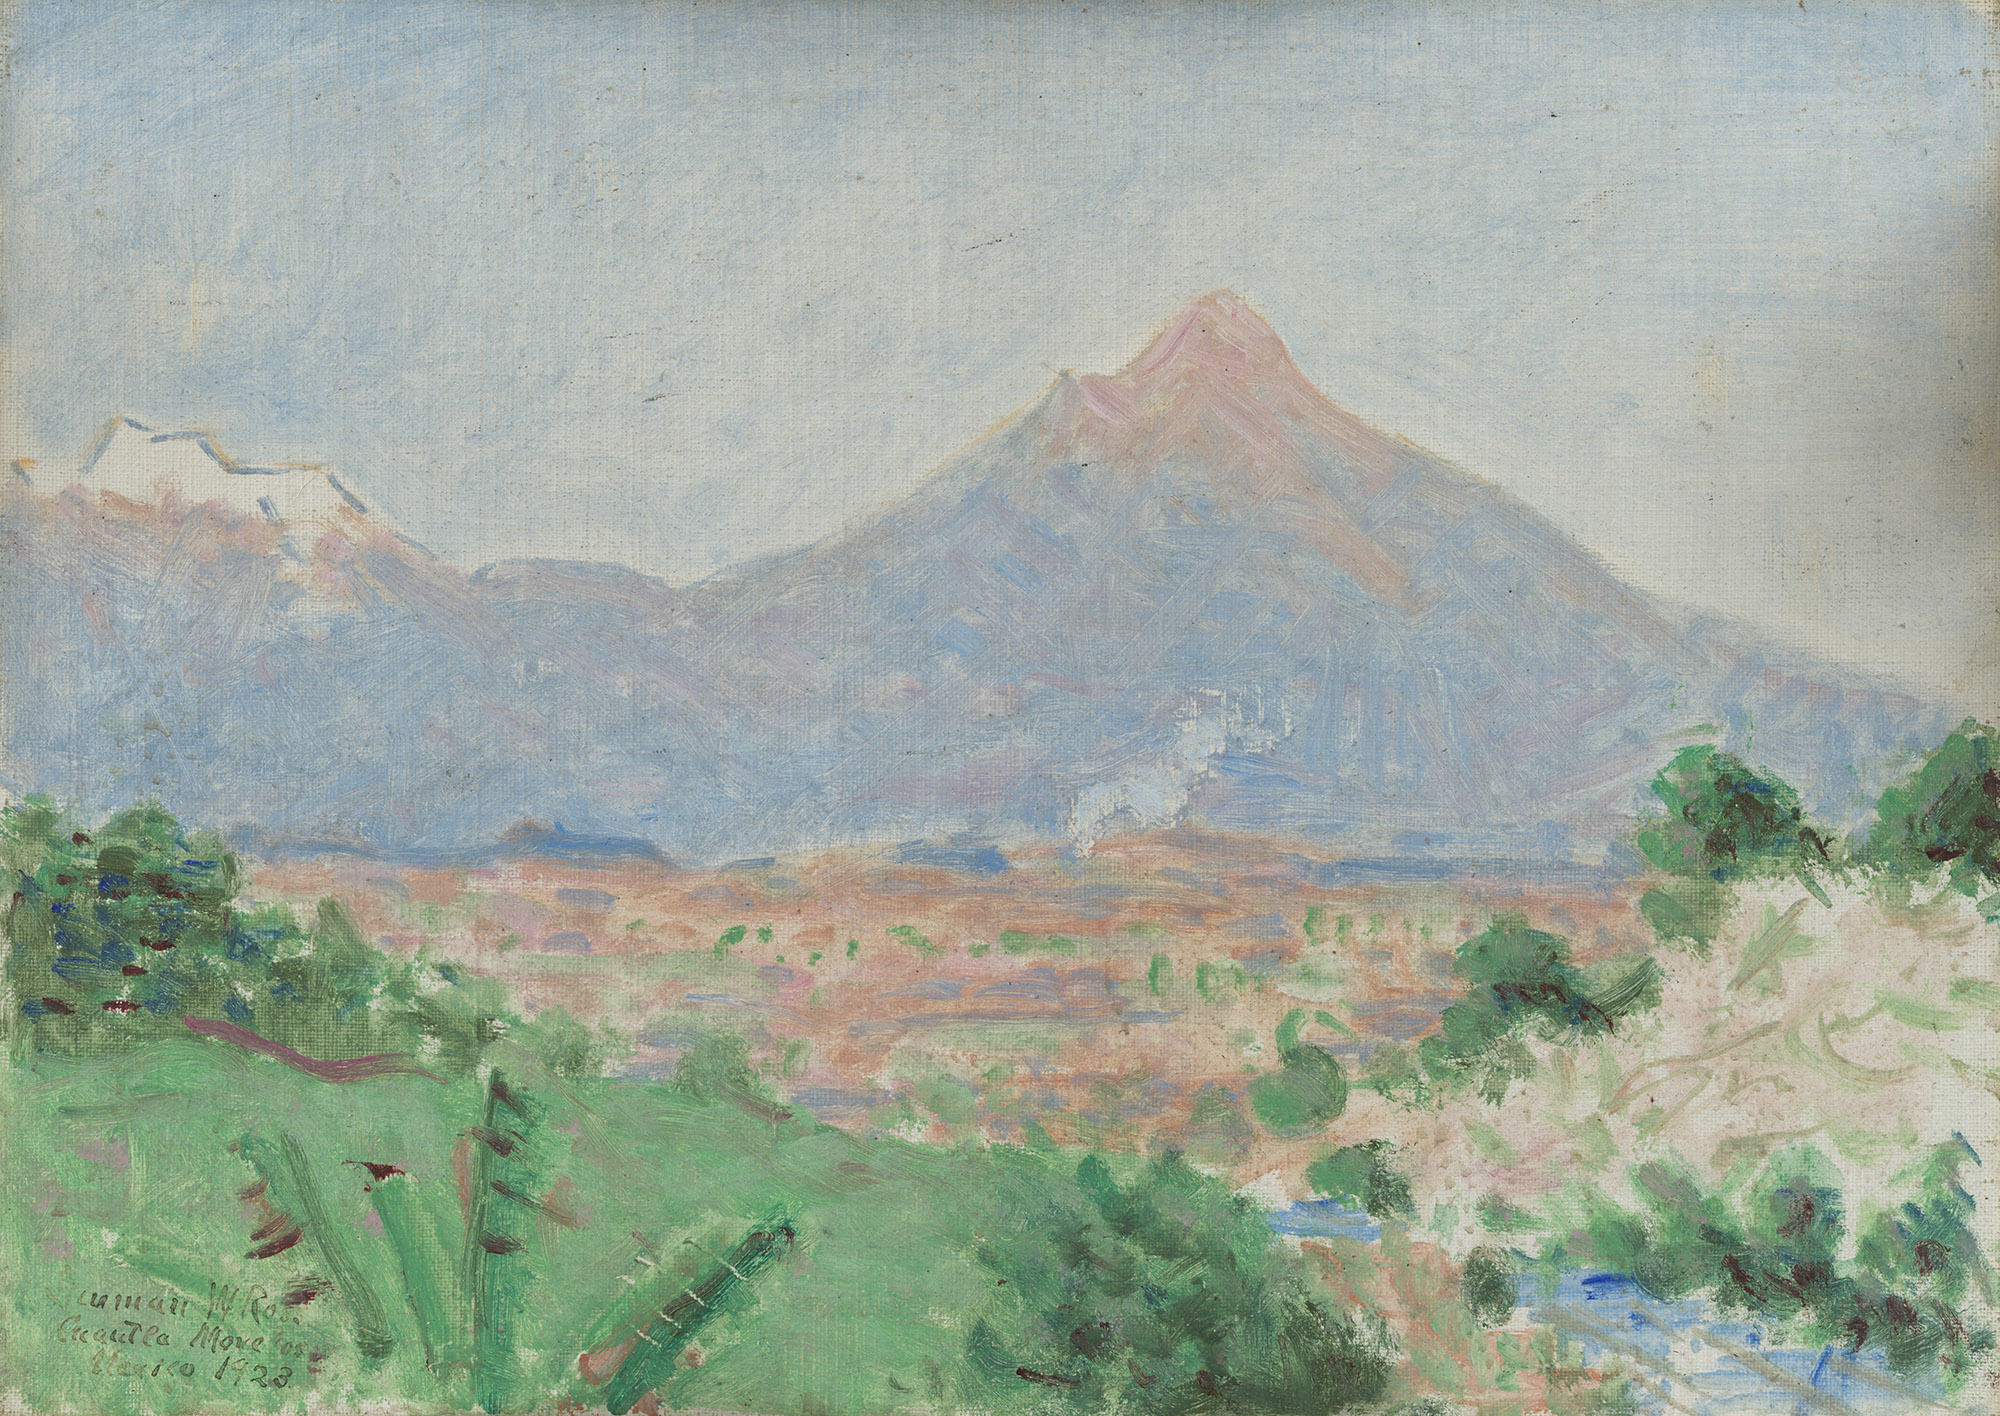 A View of Popocatépetl from Cuautla by Denman Waldo Ross